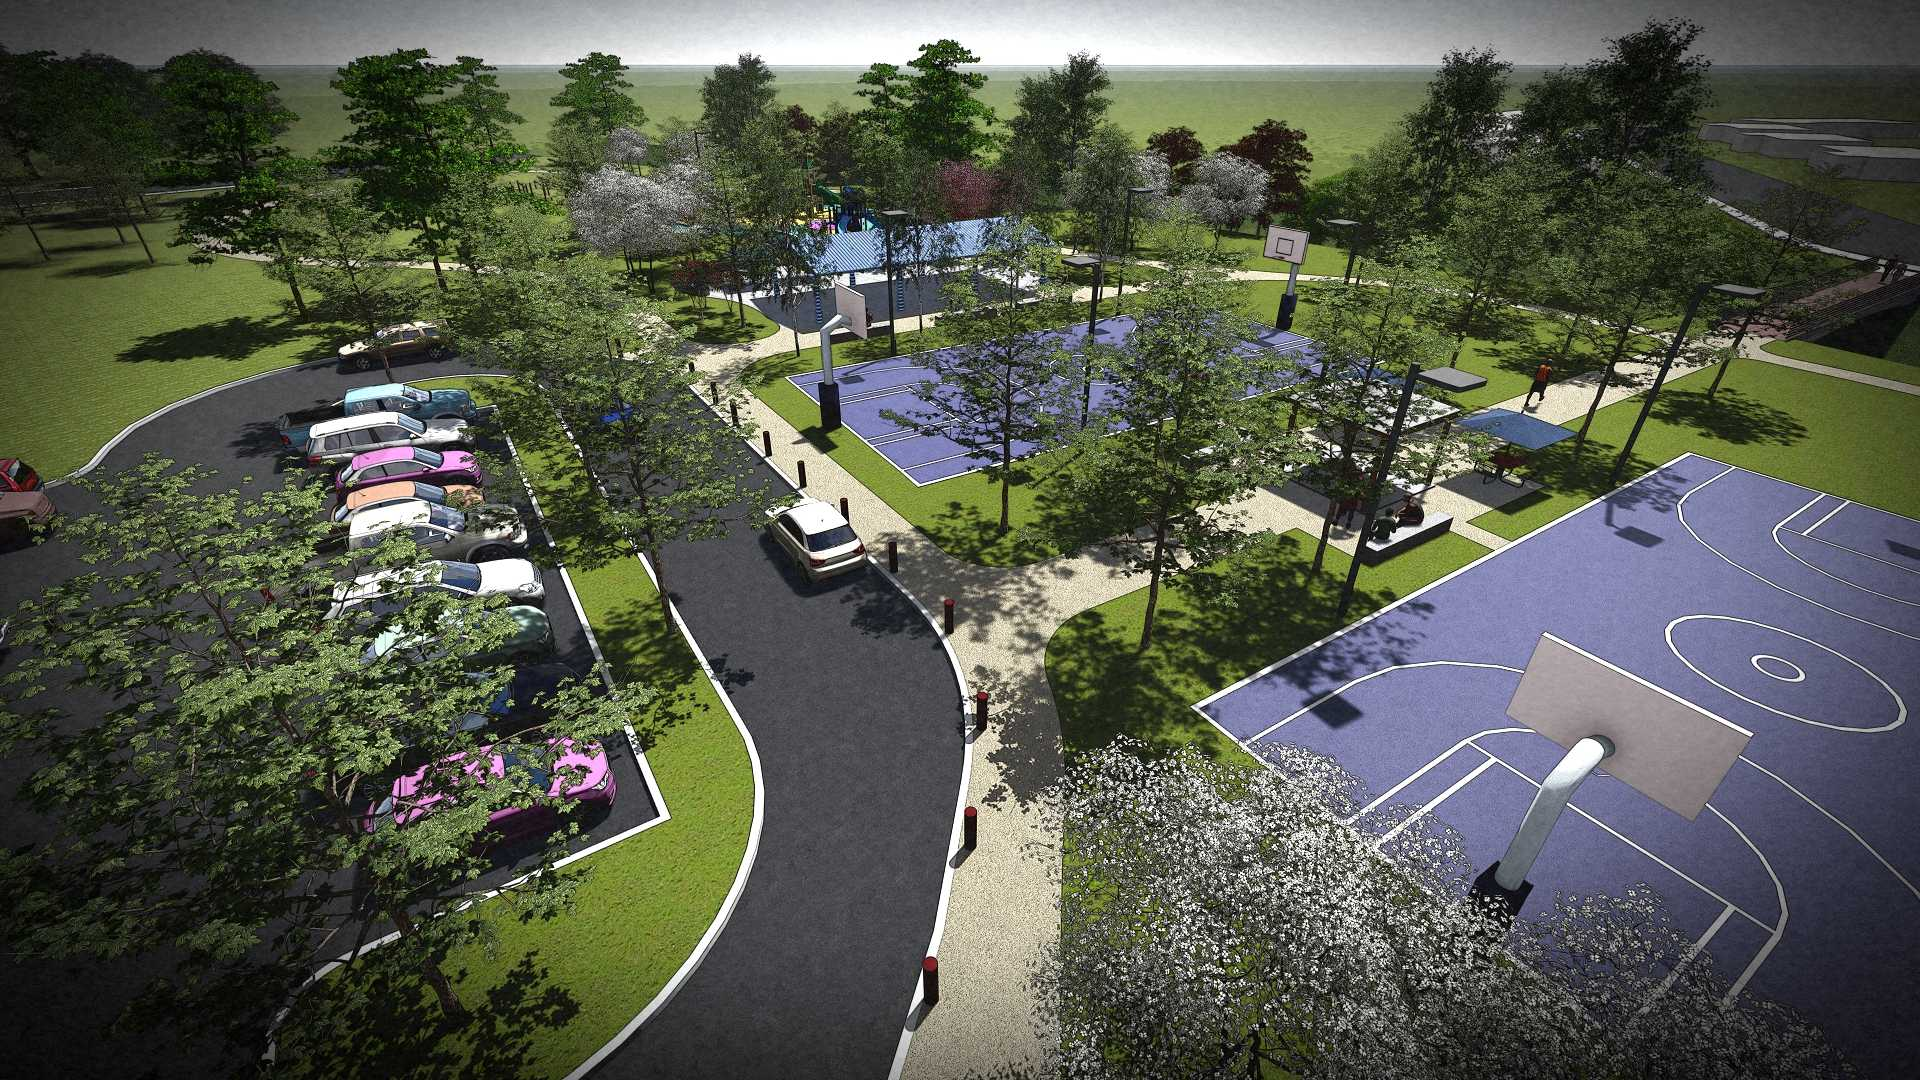 fulton-park-aerial-bball-court